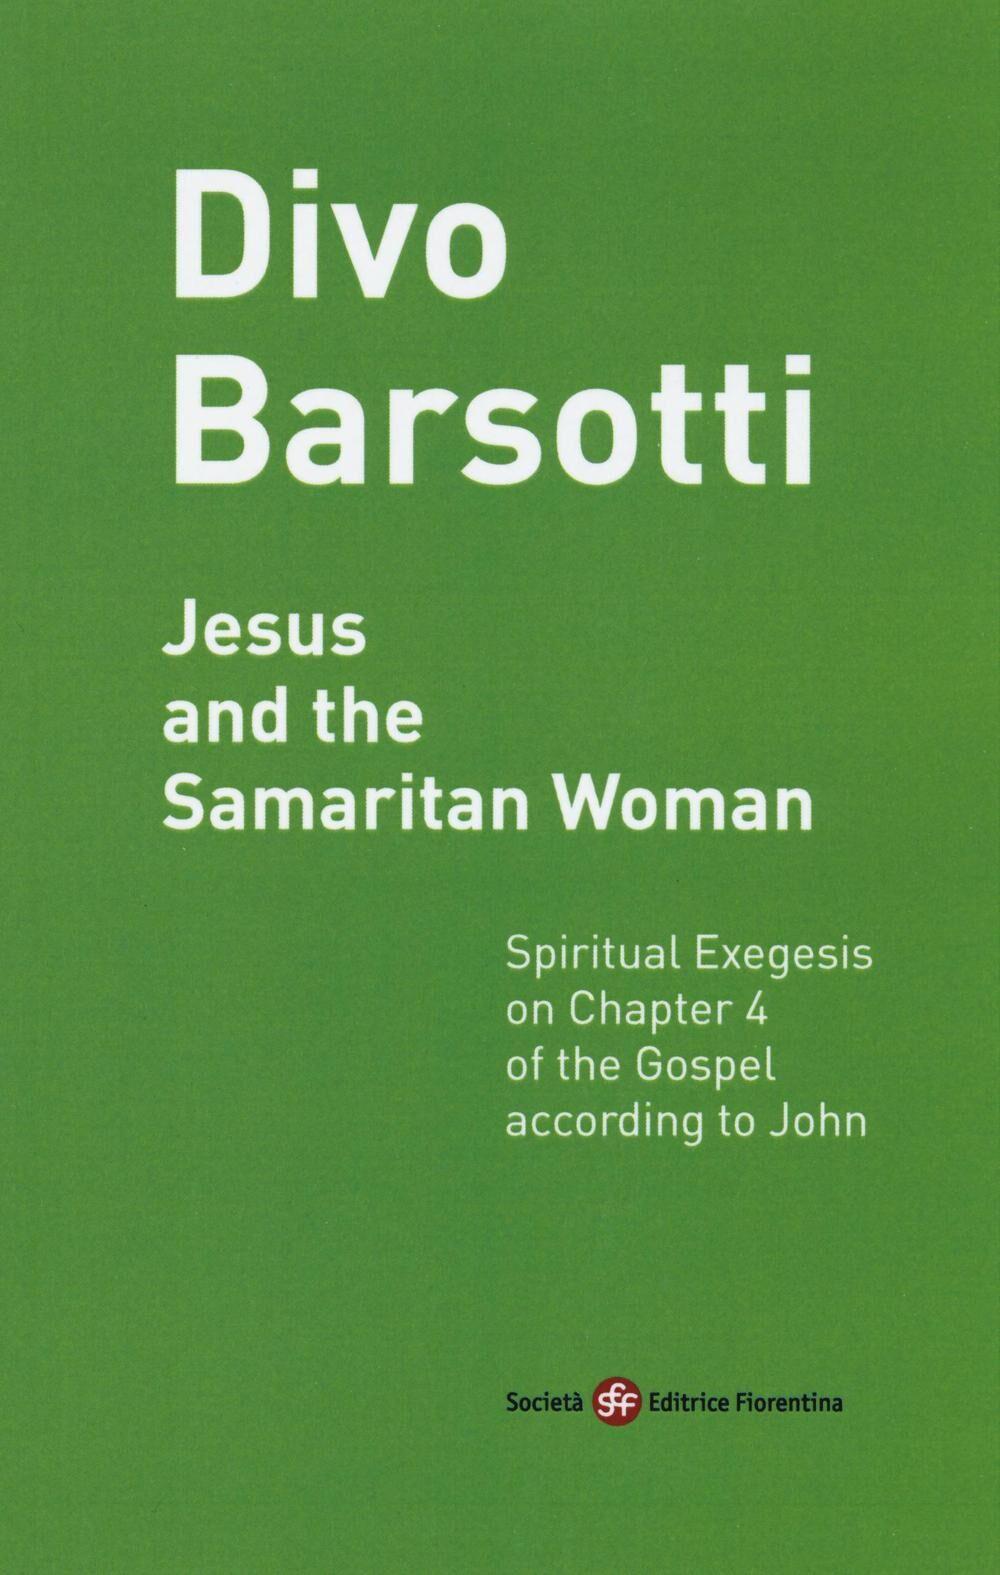 Jesus and the Samaritan woman. Spiritual exegesis on chapter 4 of the Gospel according John